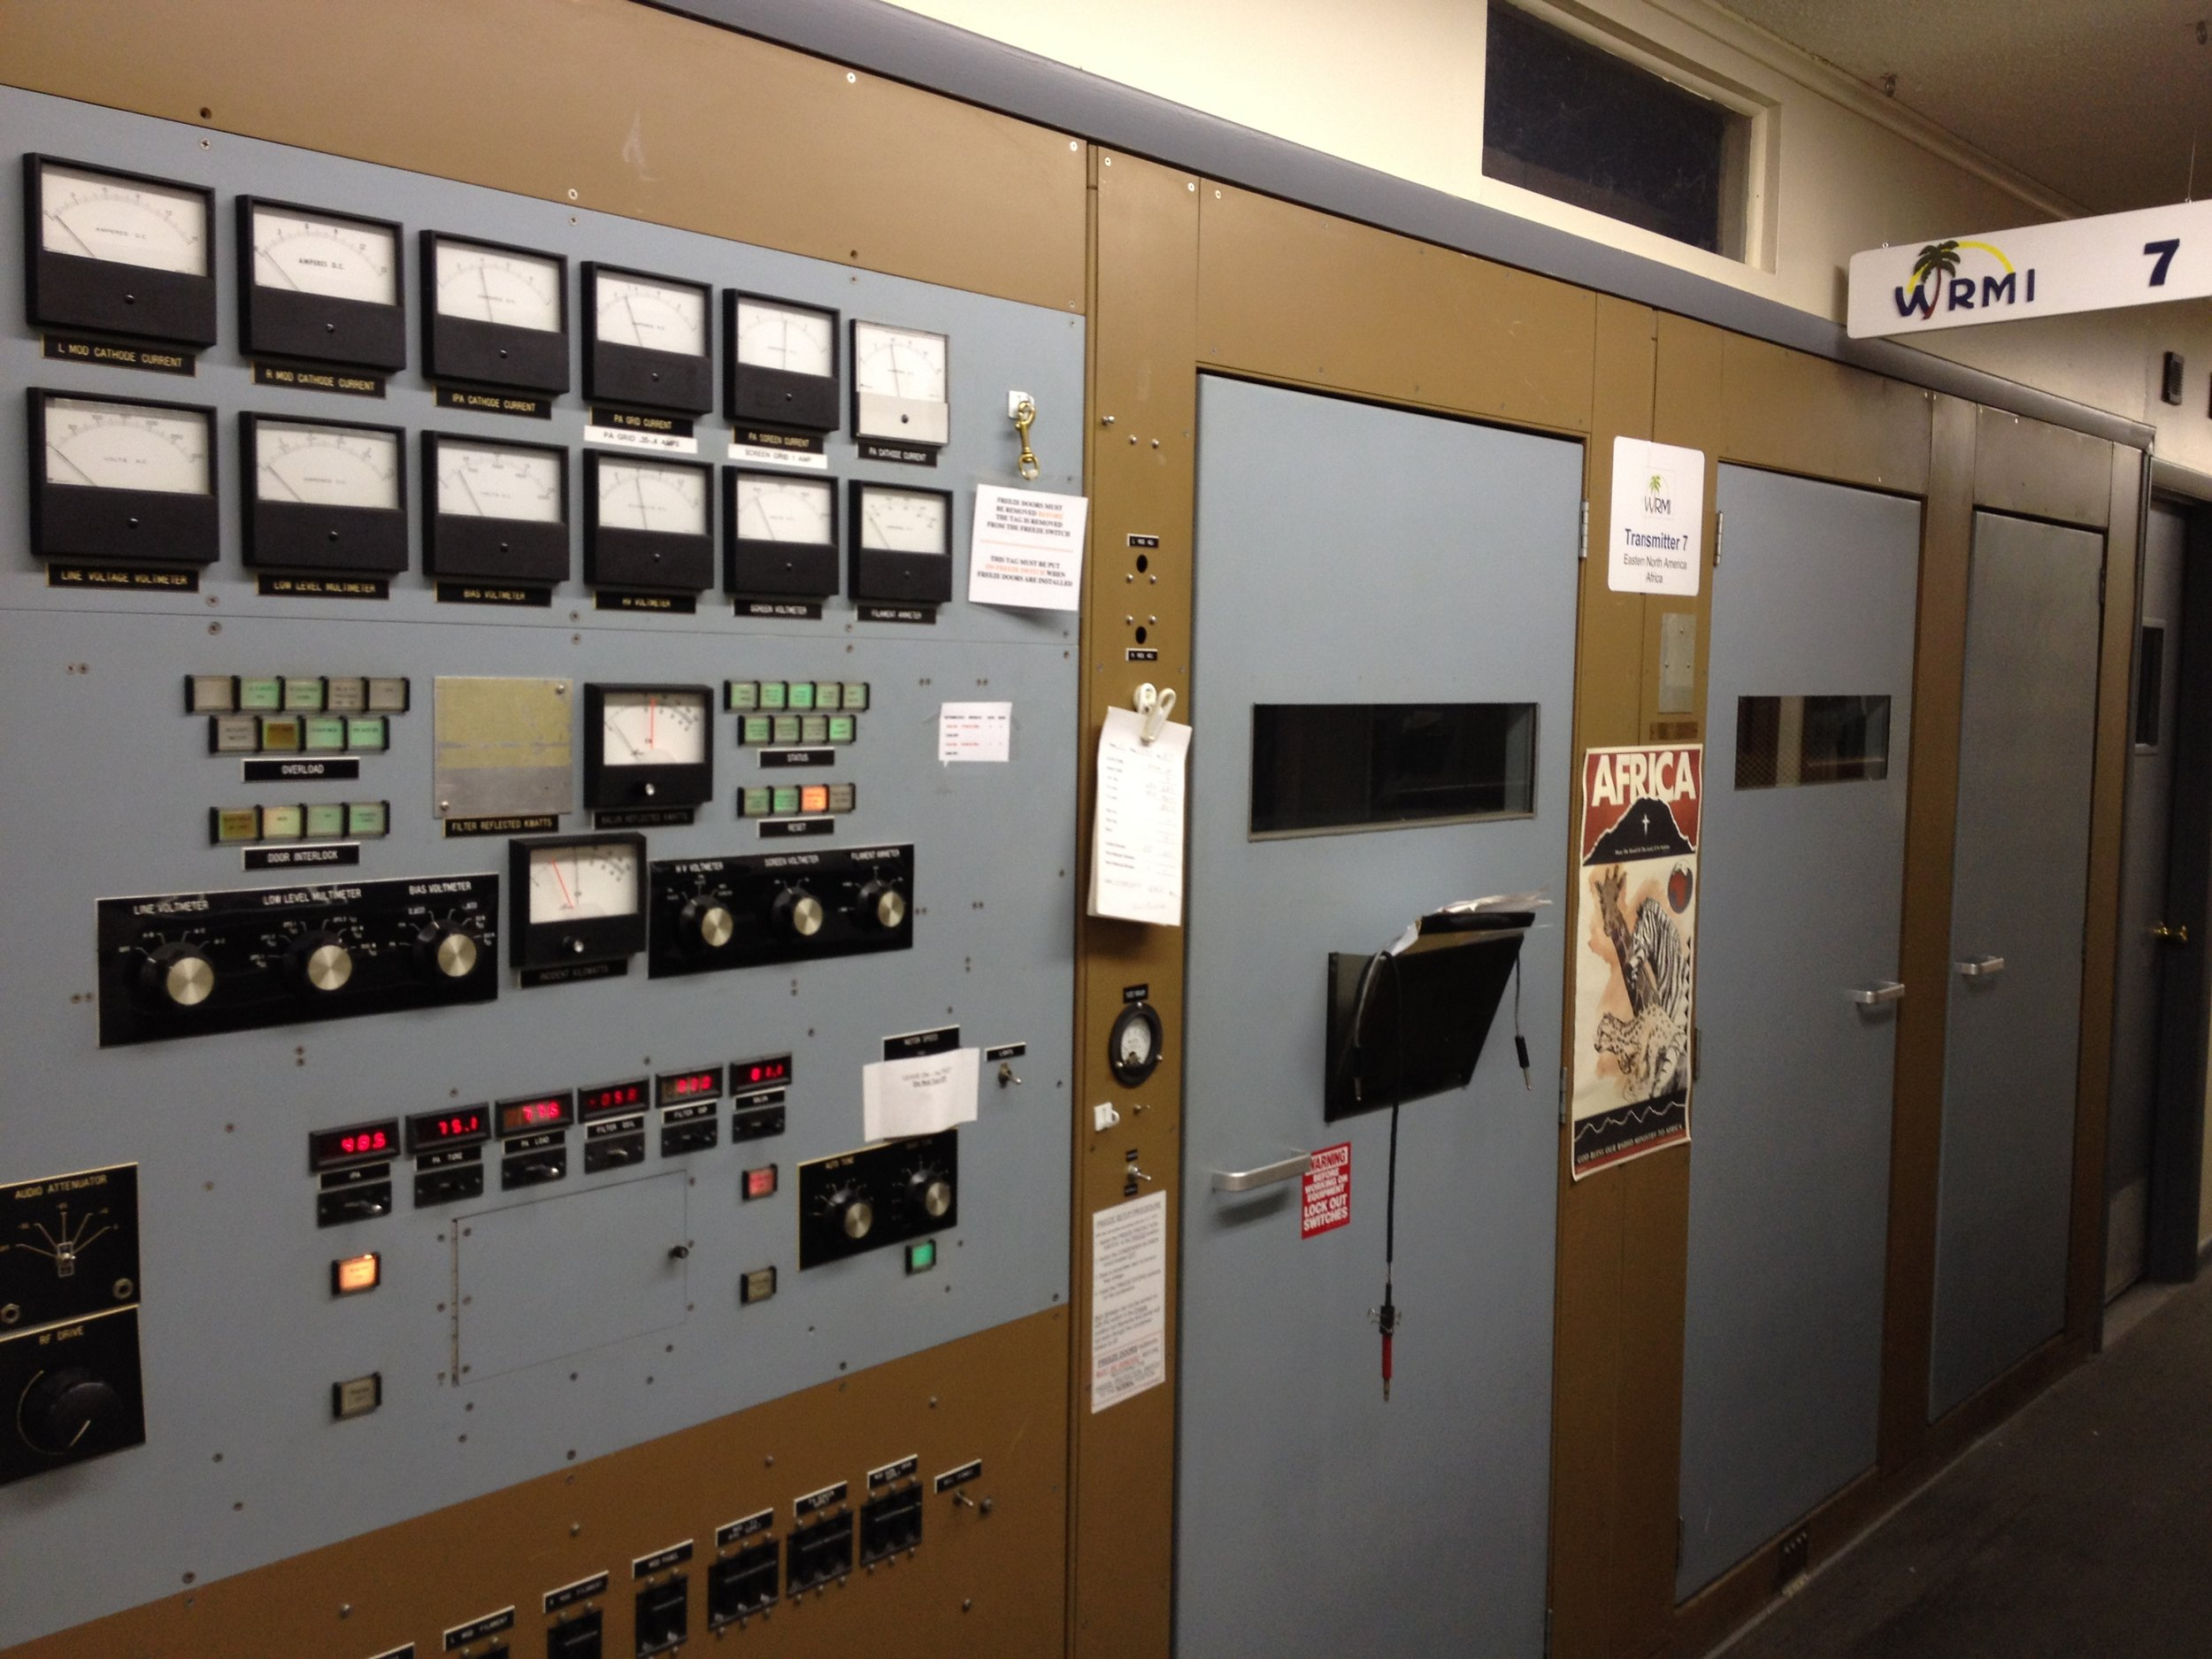 Radio Africa Transmitters.JPG